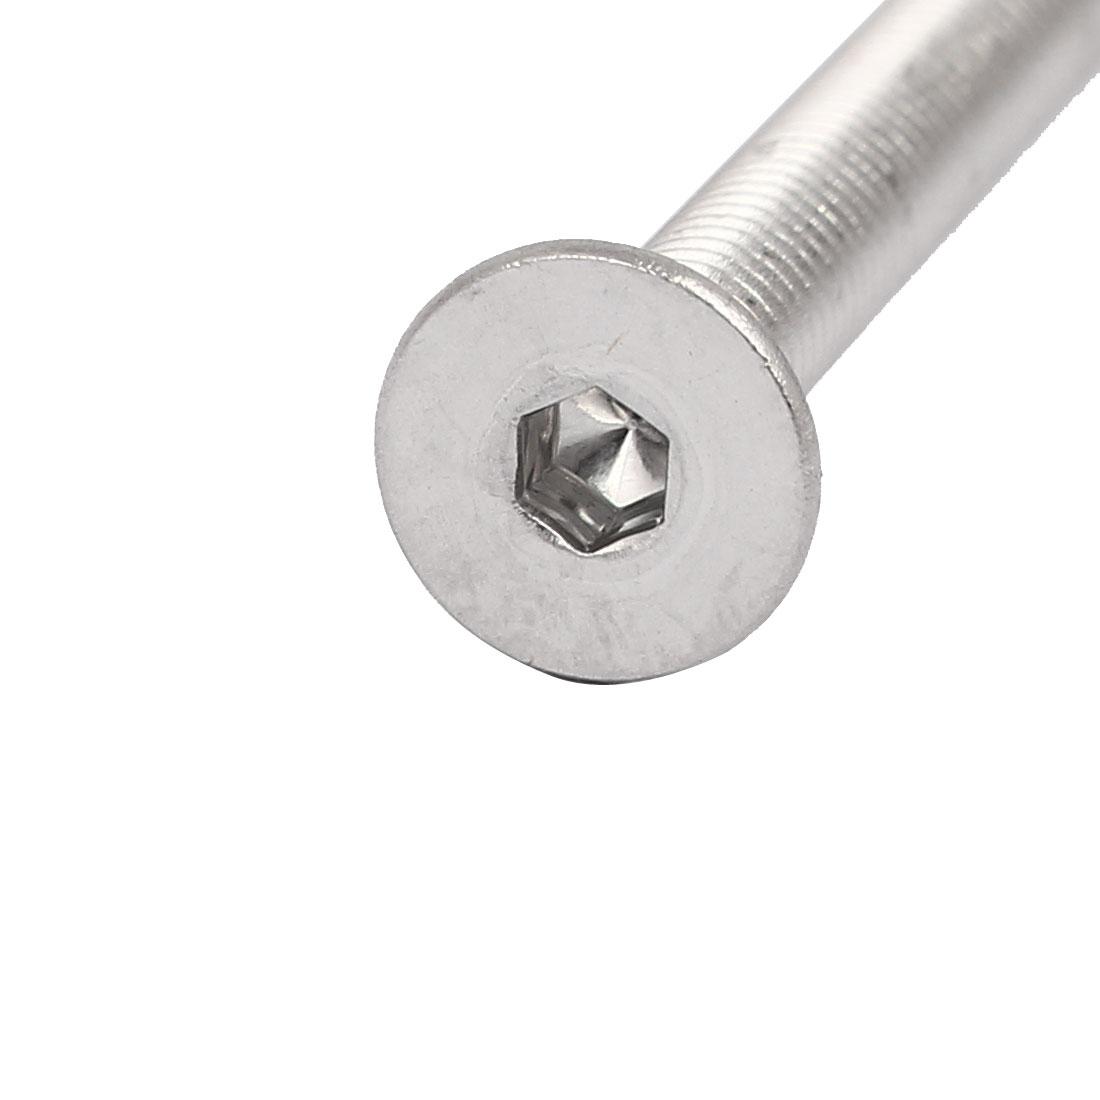 M4x55mm 304 Stainless Steel Flat Head Hex Socket Screws DIN7991 65pcs - image 2 de 4